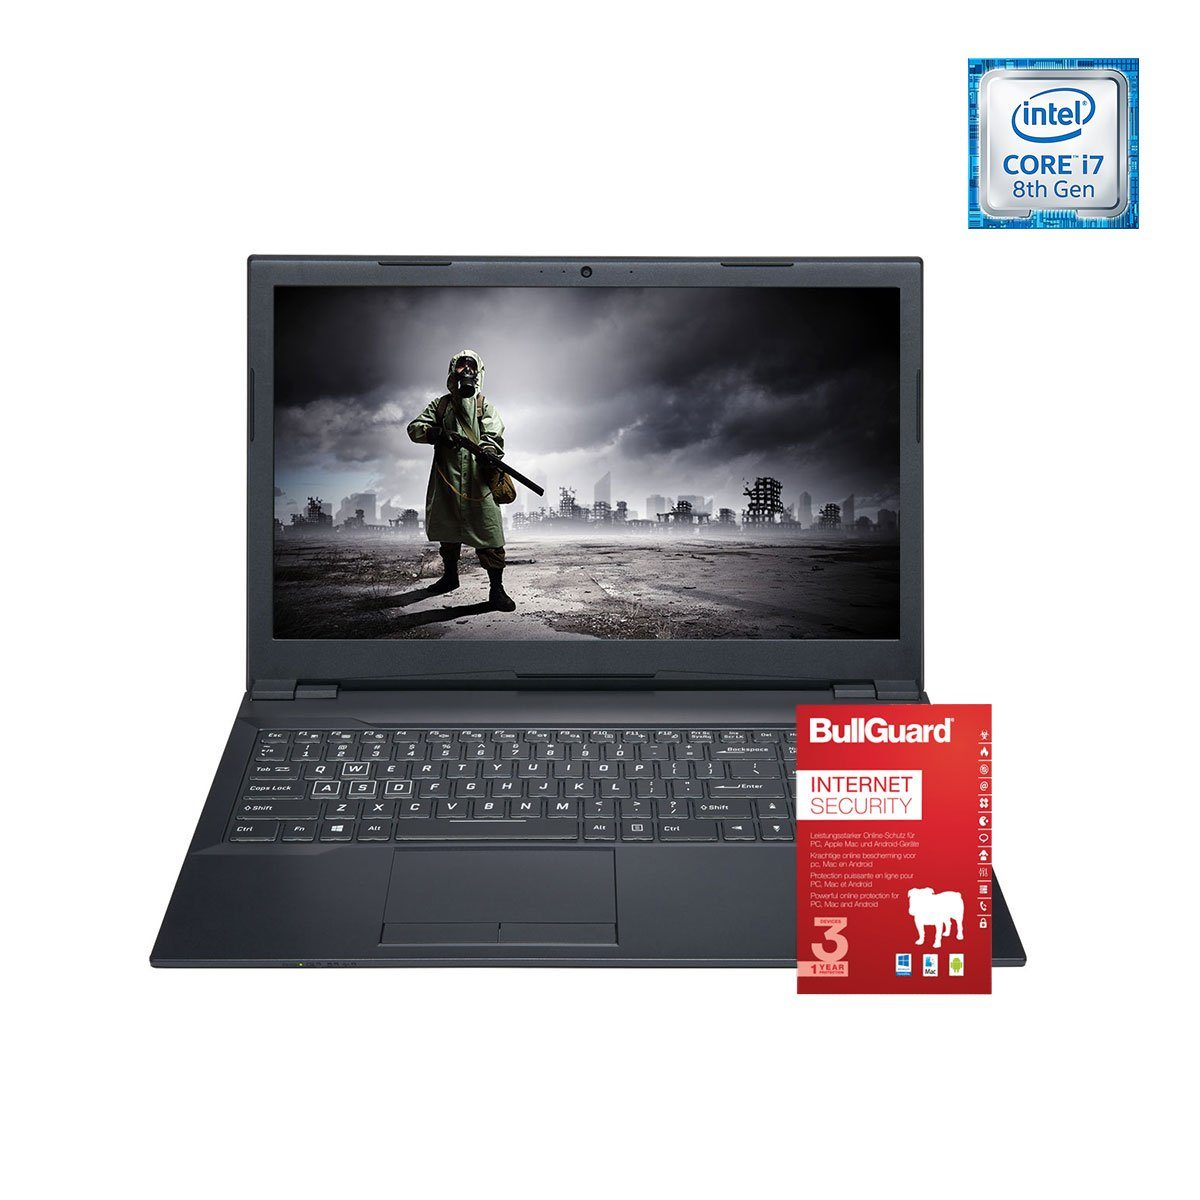 ONE GAMING Notebook, Core i7-8700, GeForce MX150, 16GB DDR4 RAM »NB 44750«